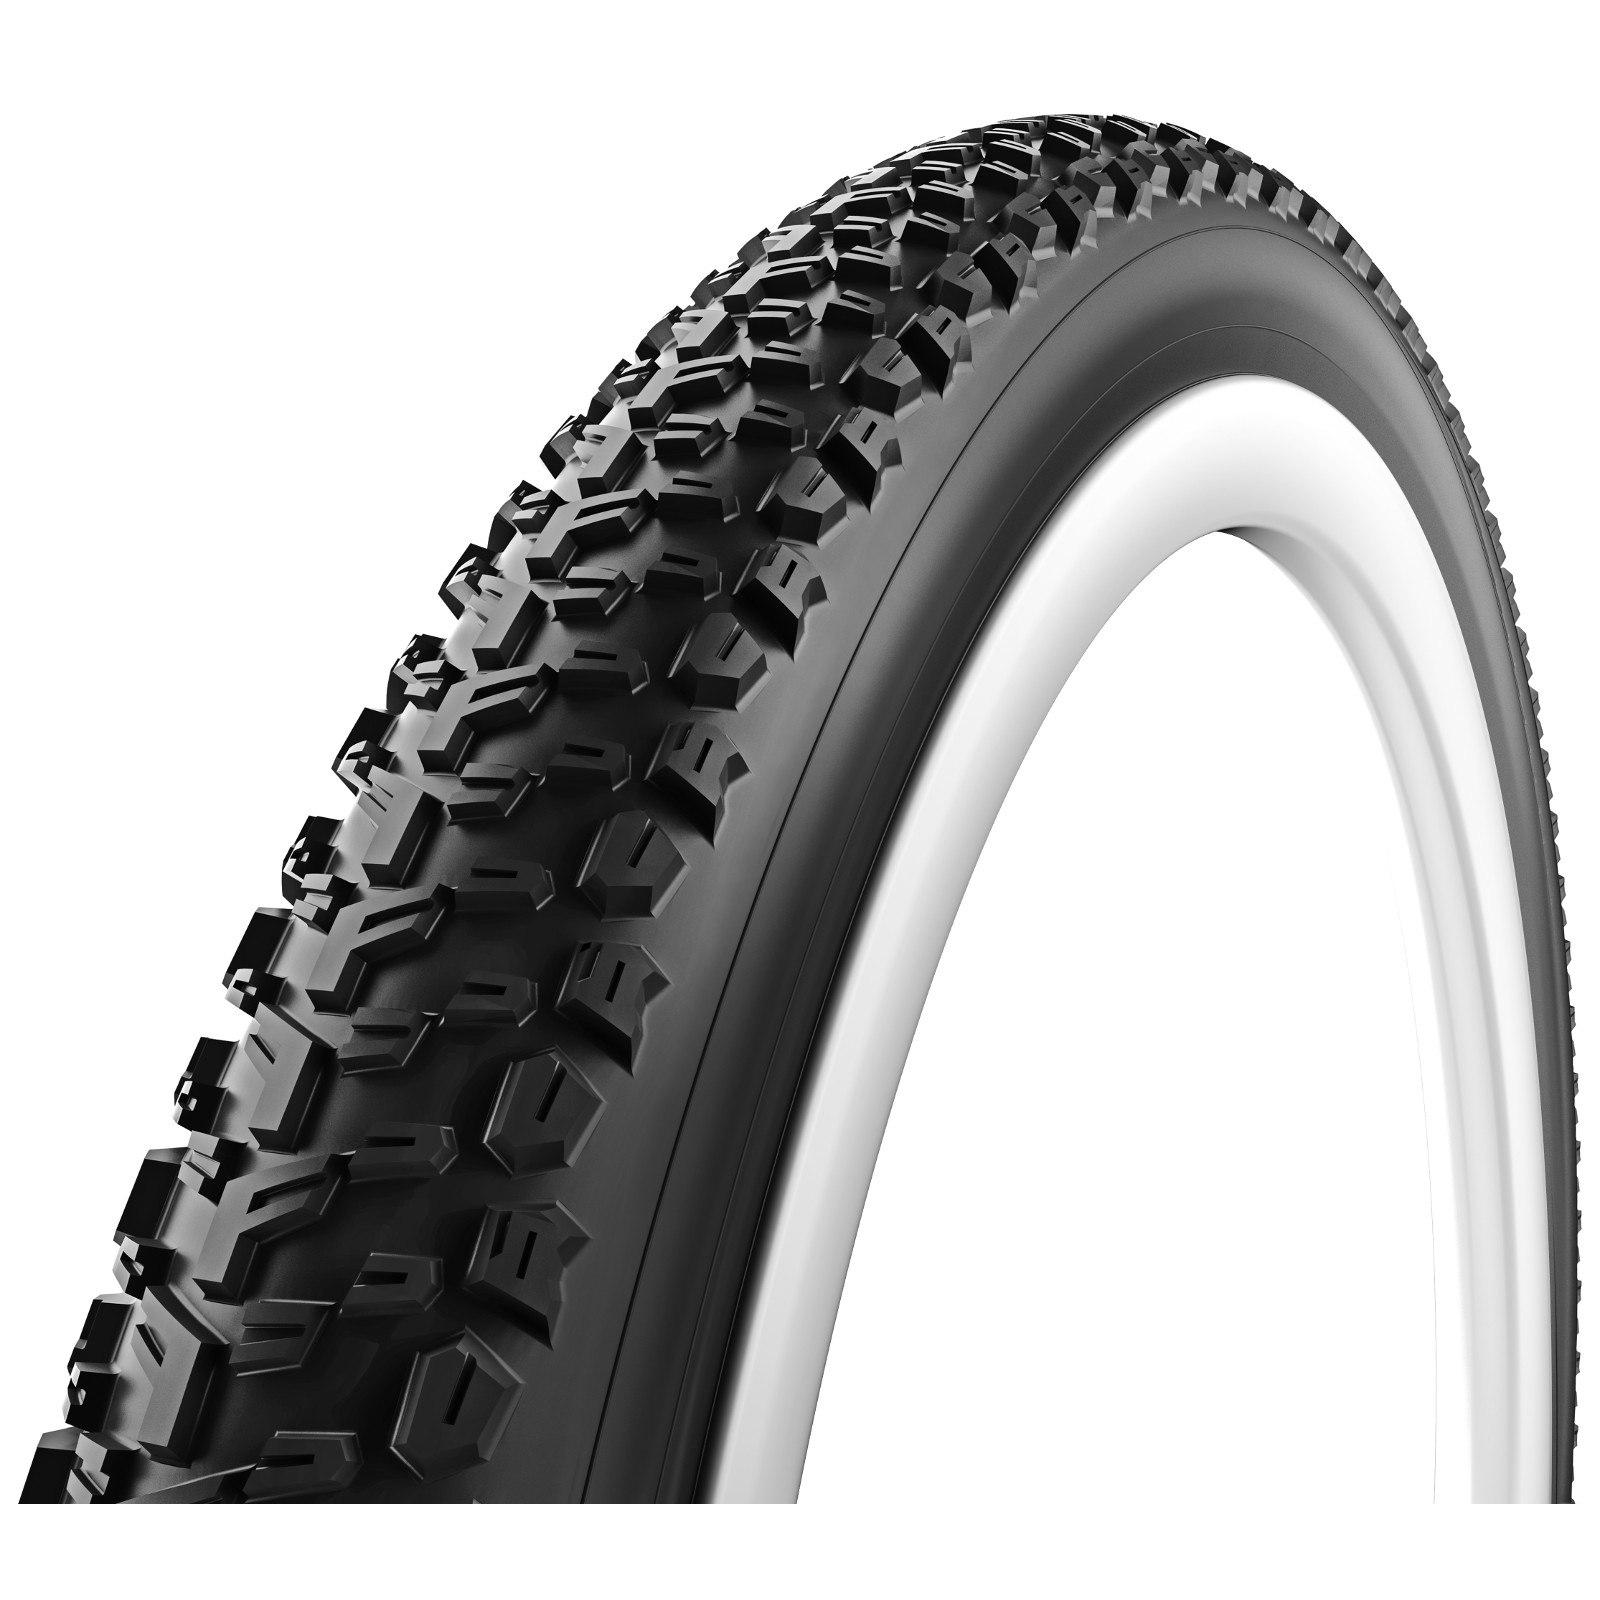 Vittoria Mezcal III 29 Inch MTB Wire Bead Tire - black - ETRTO 52-622